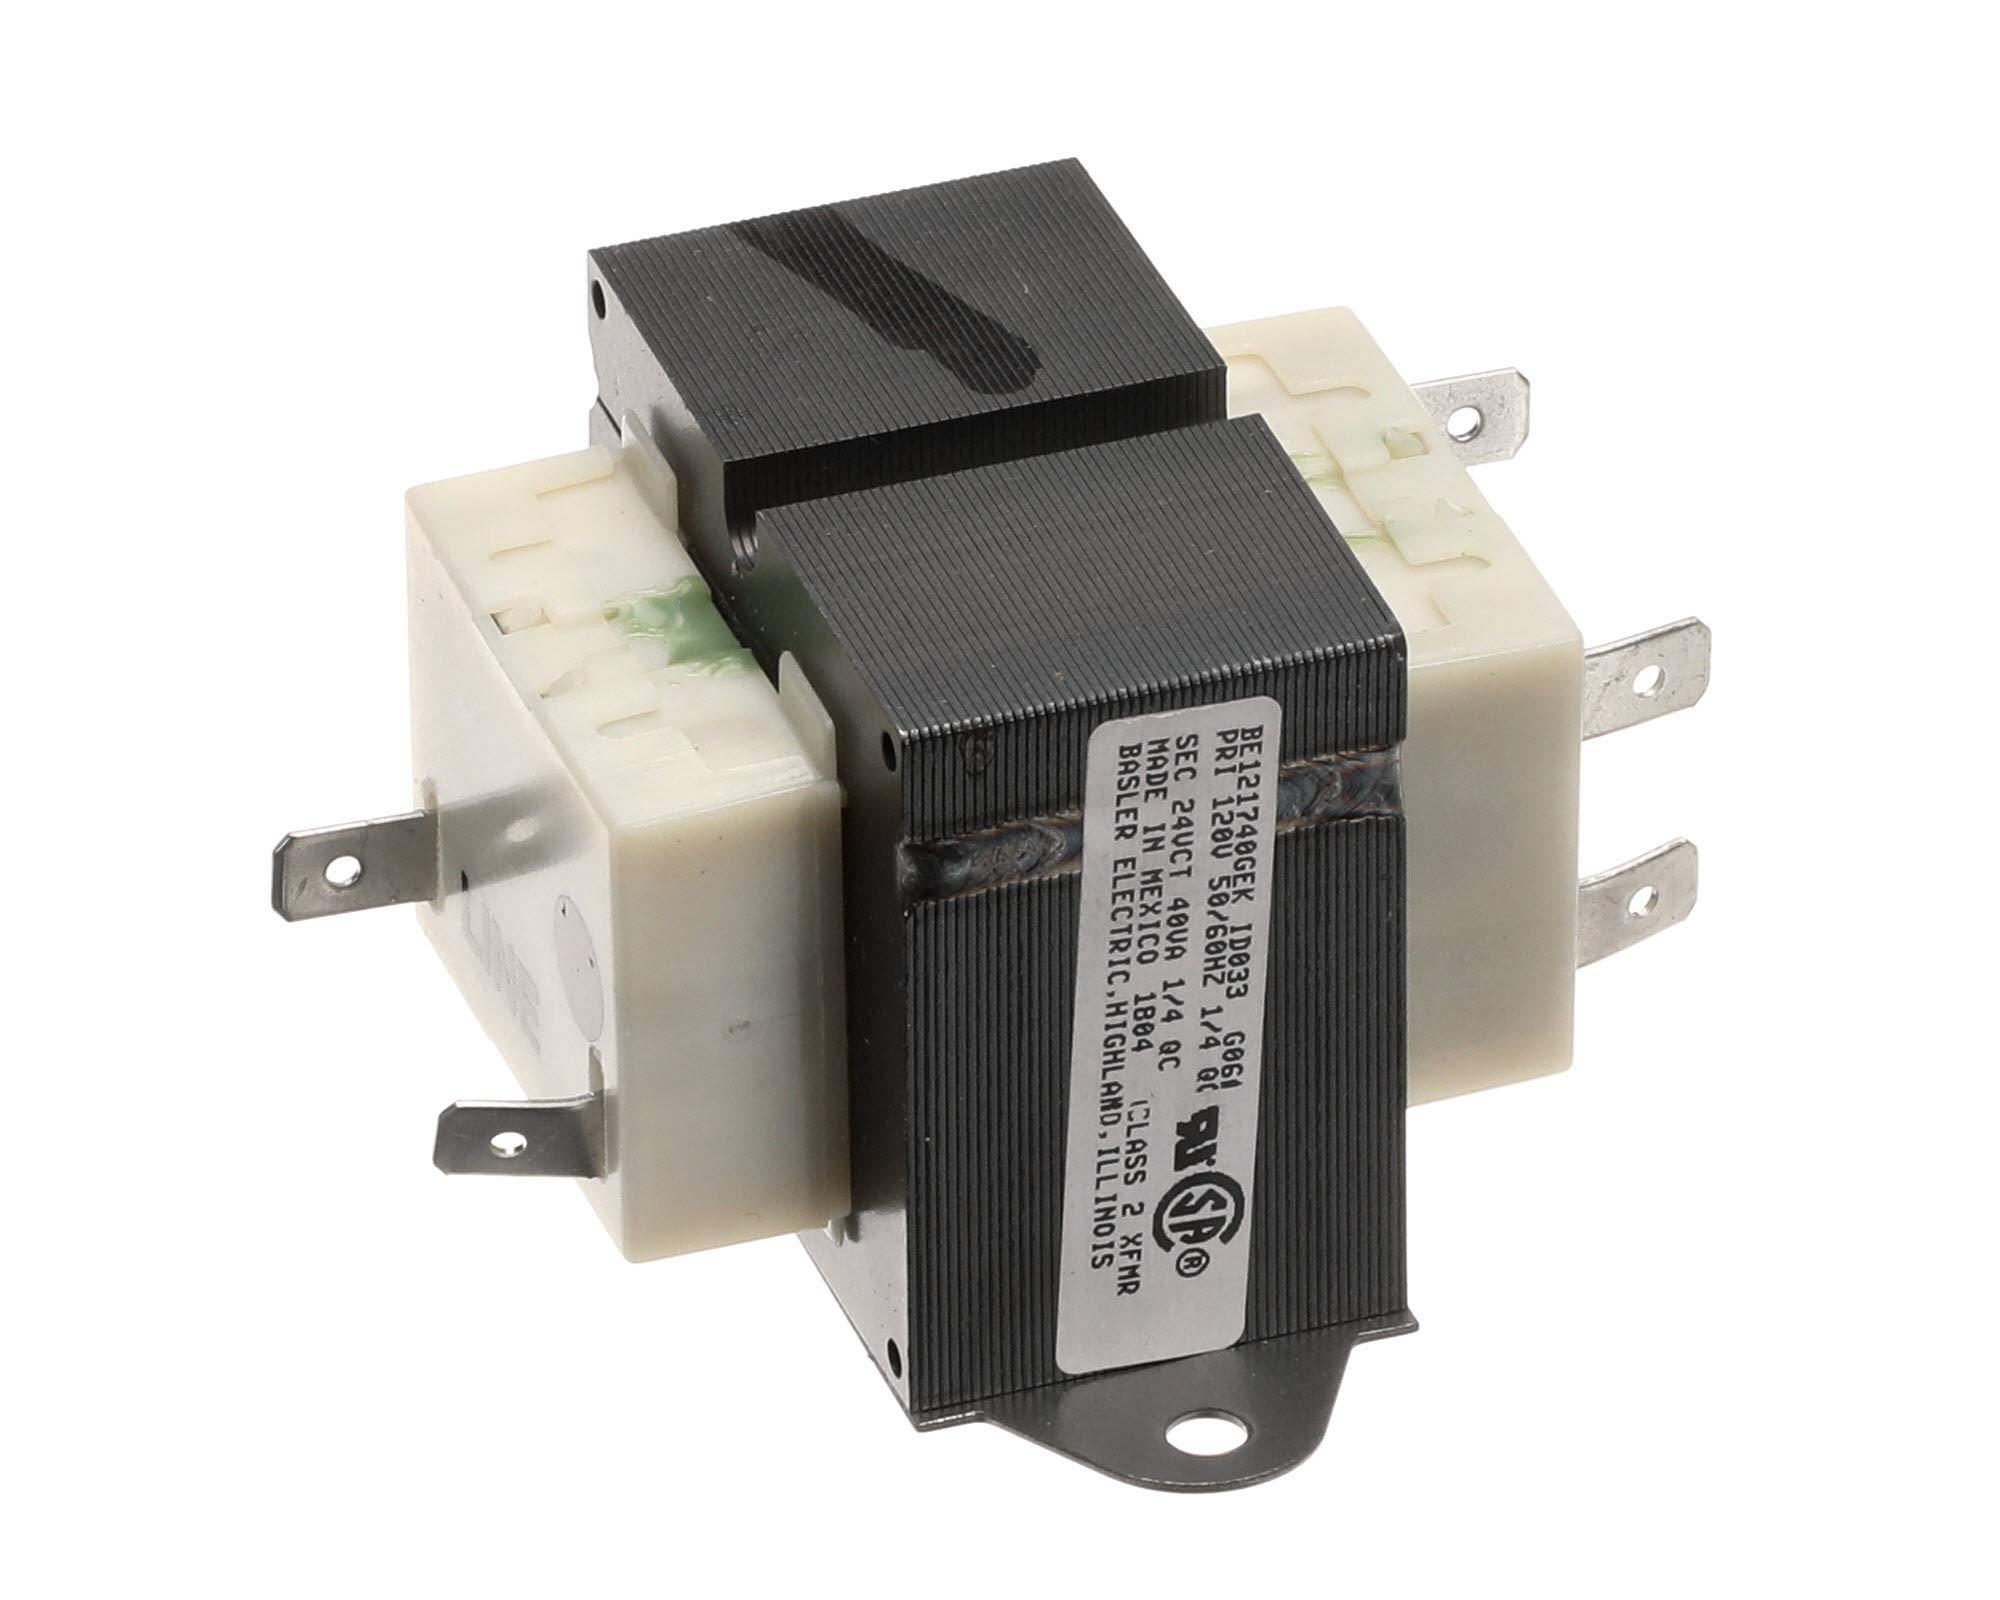 Newco 105115 24Vct 40Va Transformer.120Vp